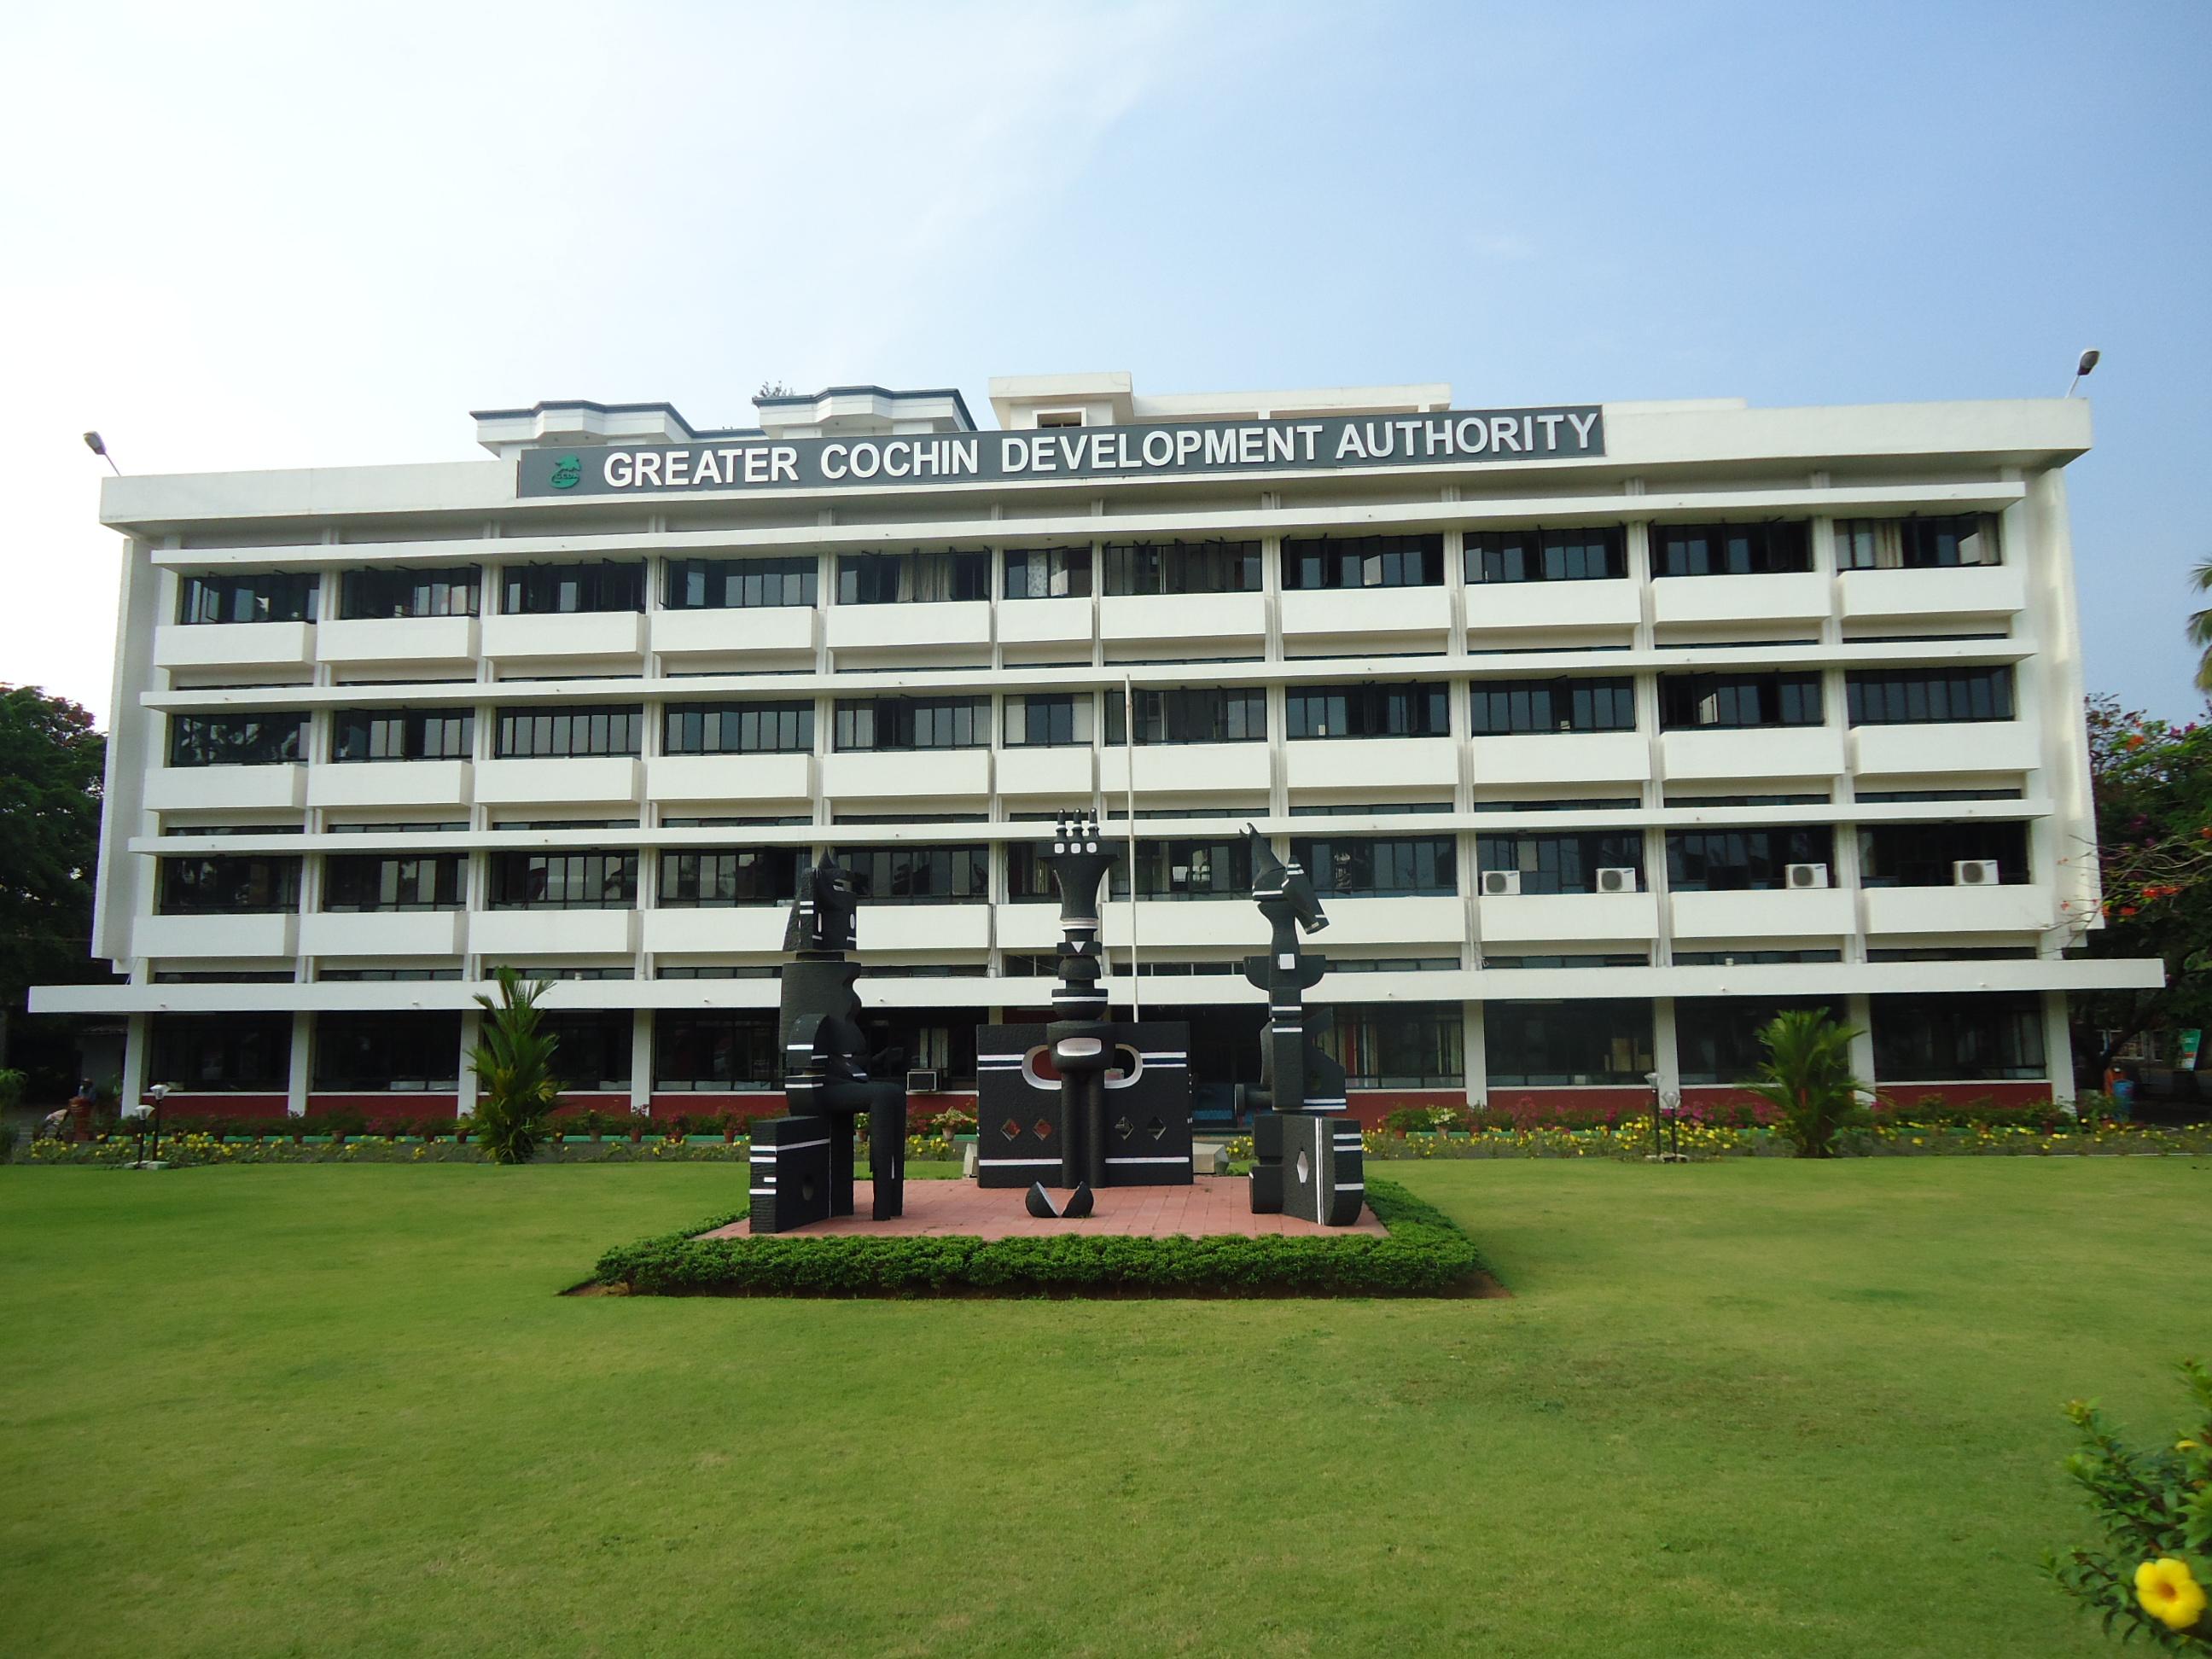 Greater Cochin Development Authority - Wikipedia